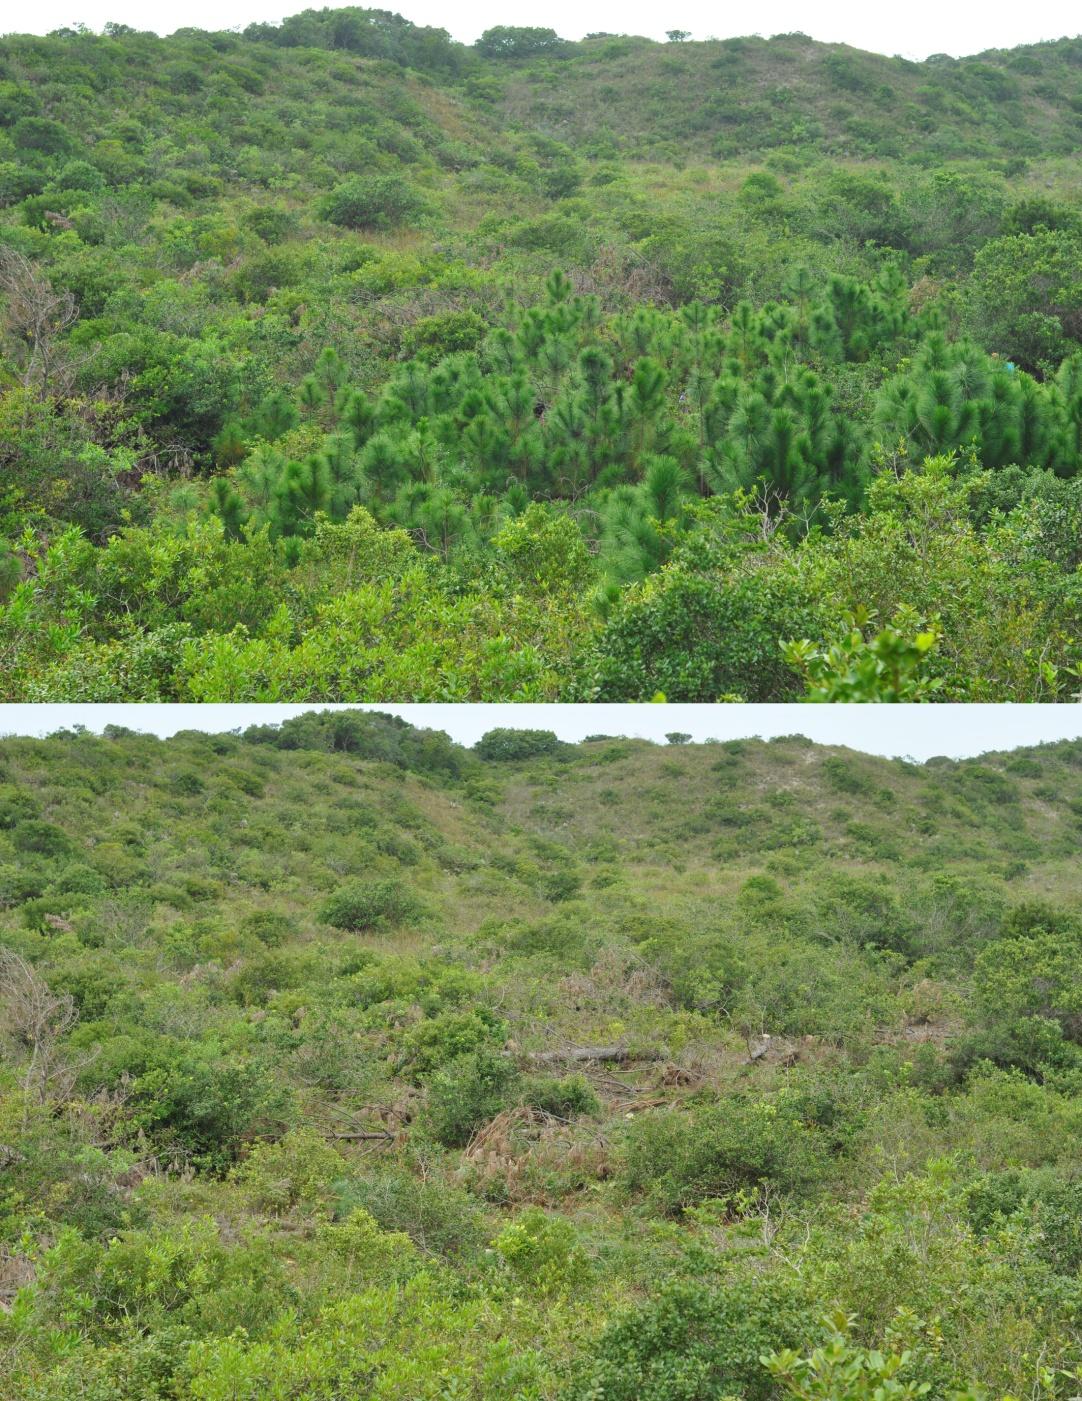 Testimonies Conservation Areas In Brazil